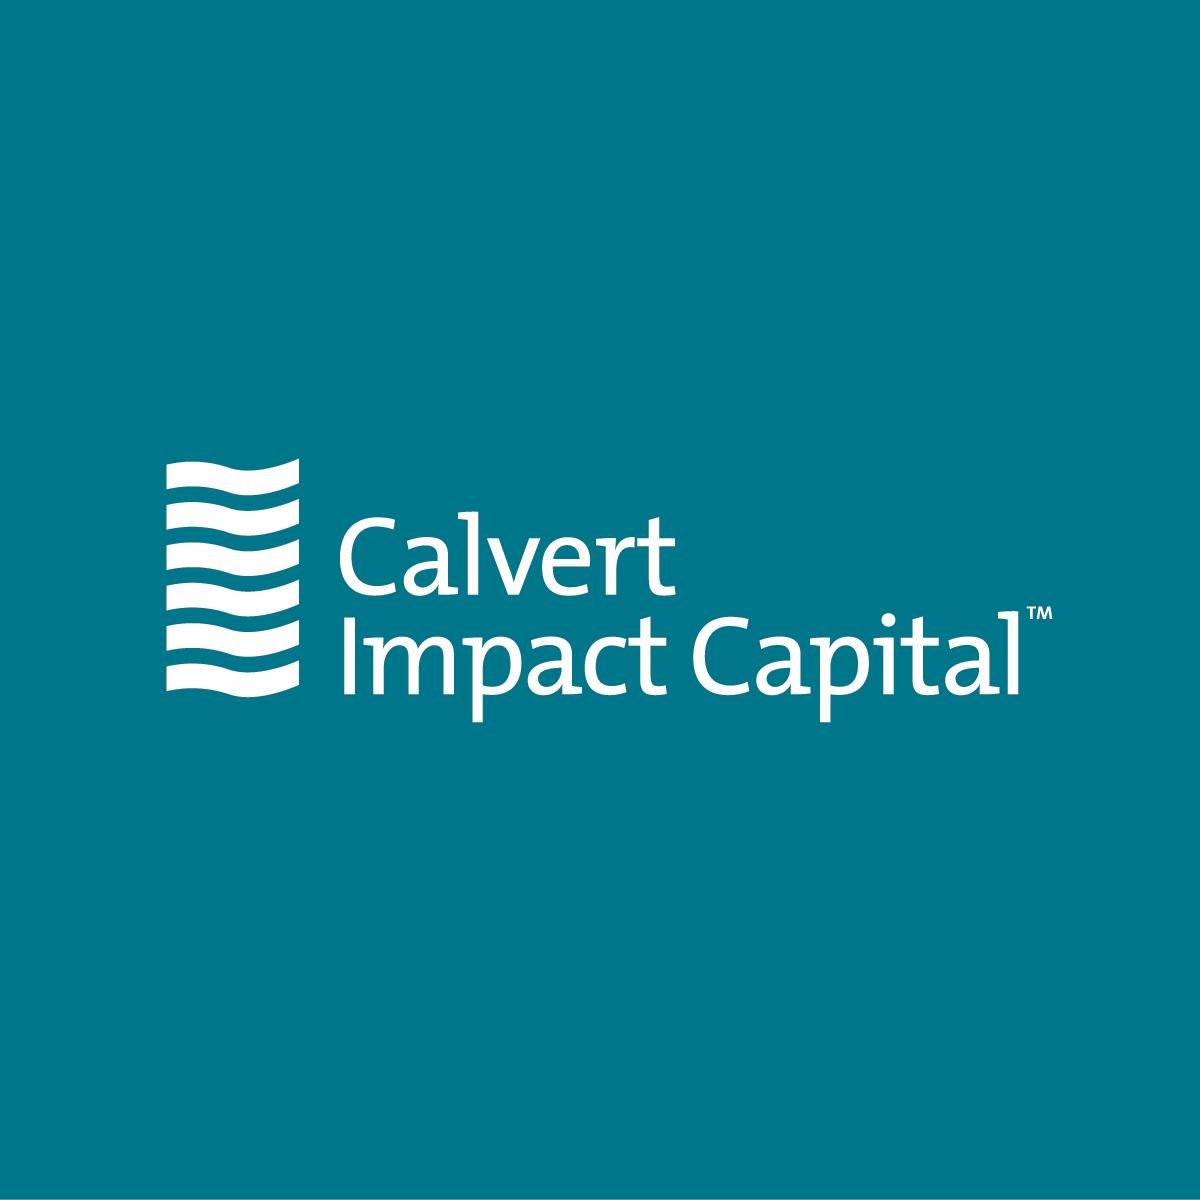 Calvert Impact Capital